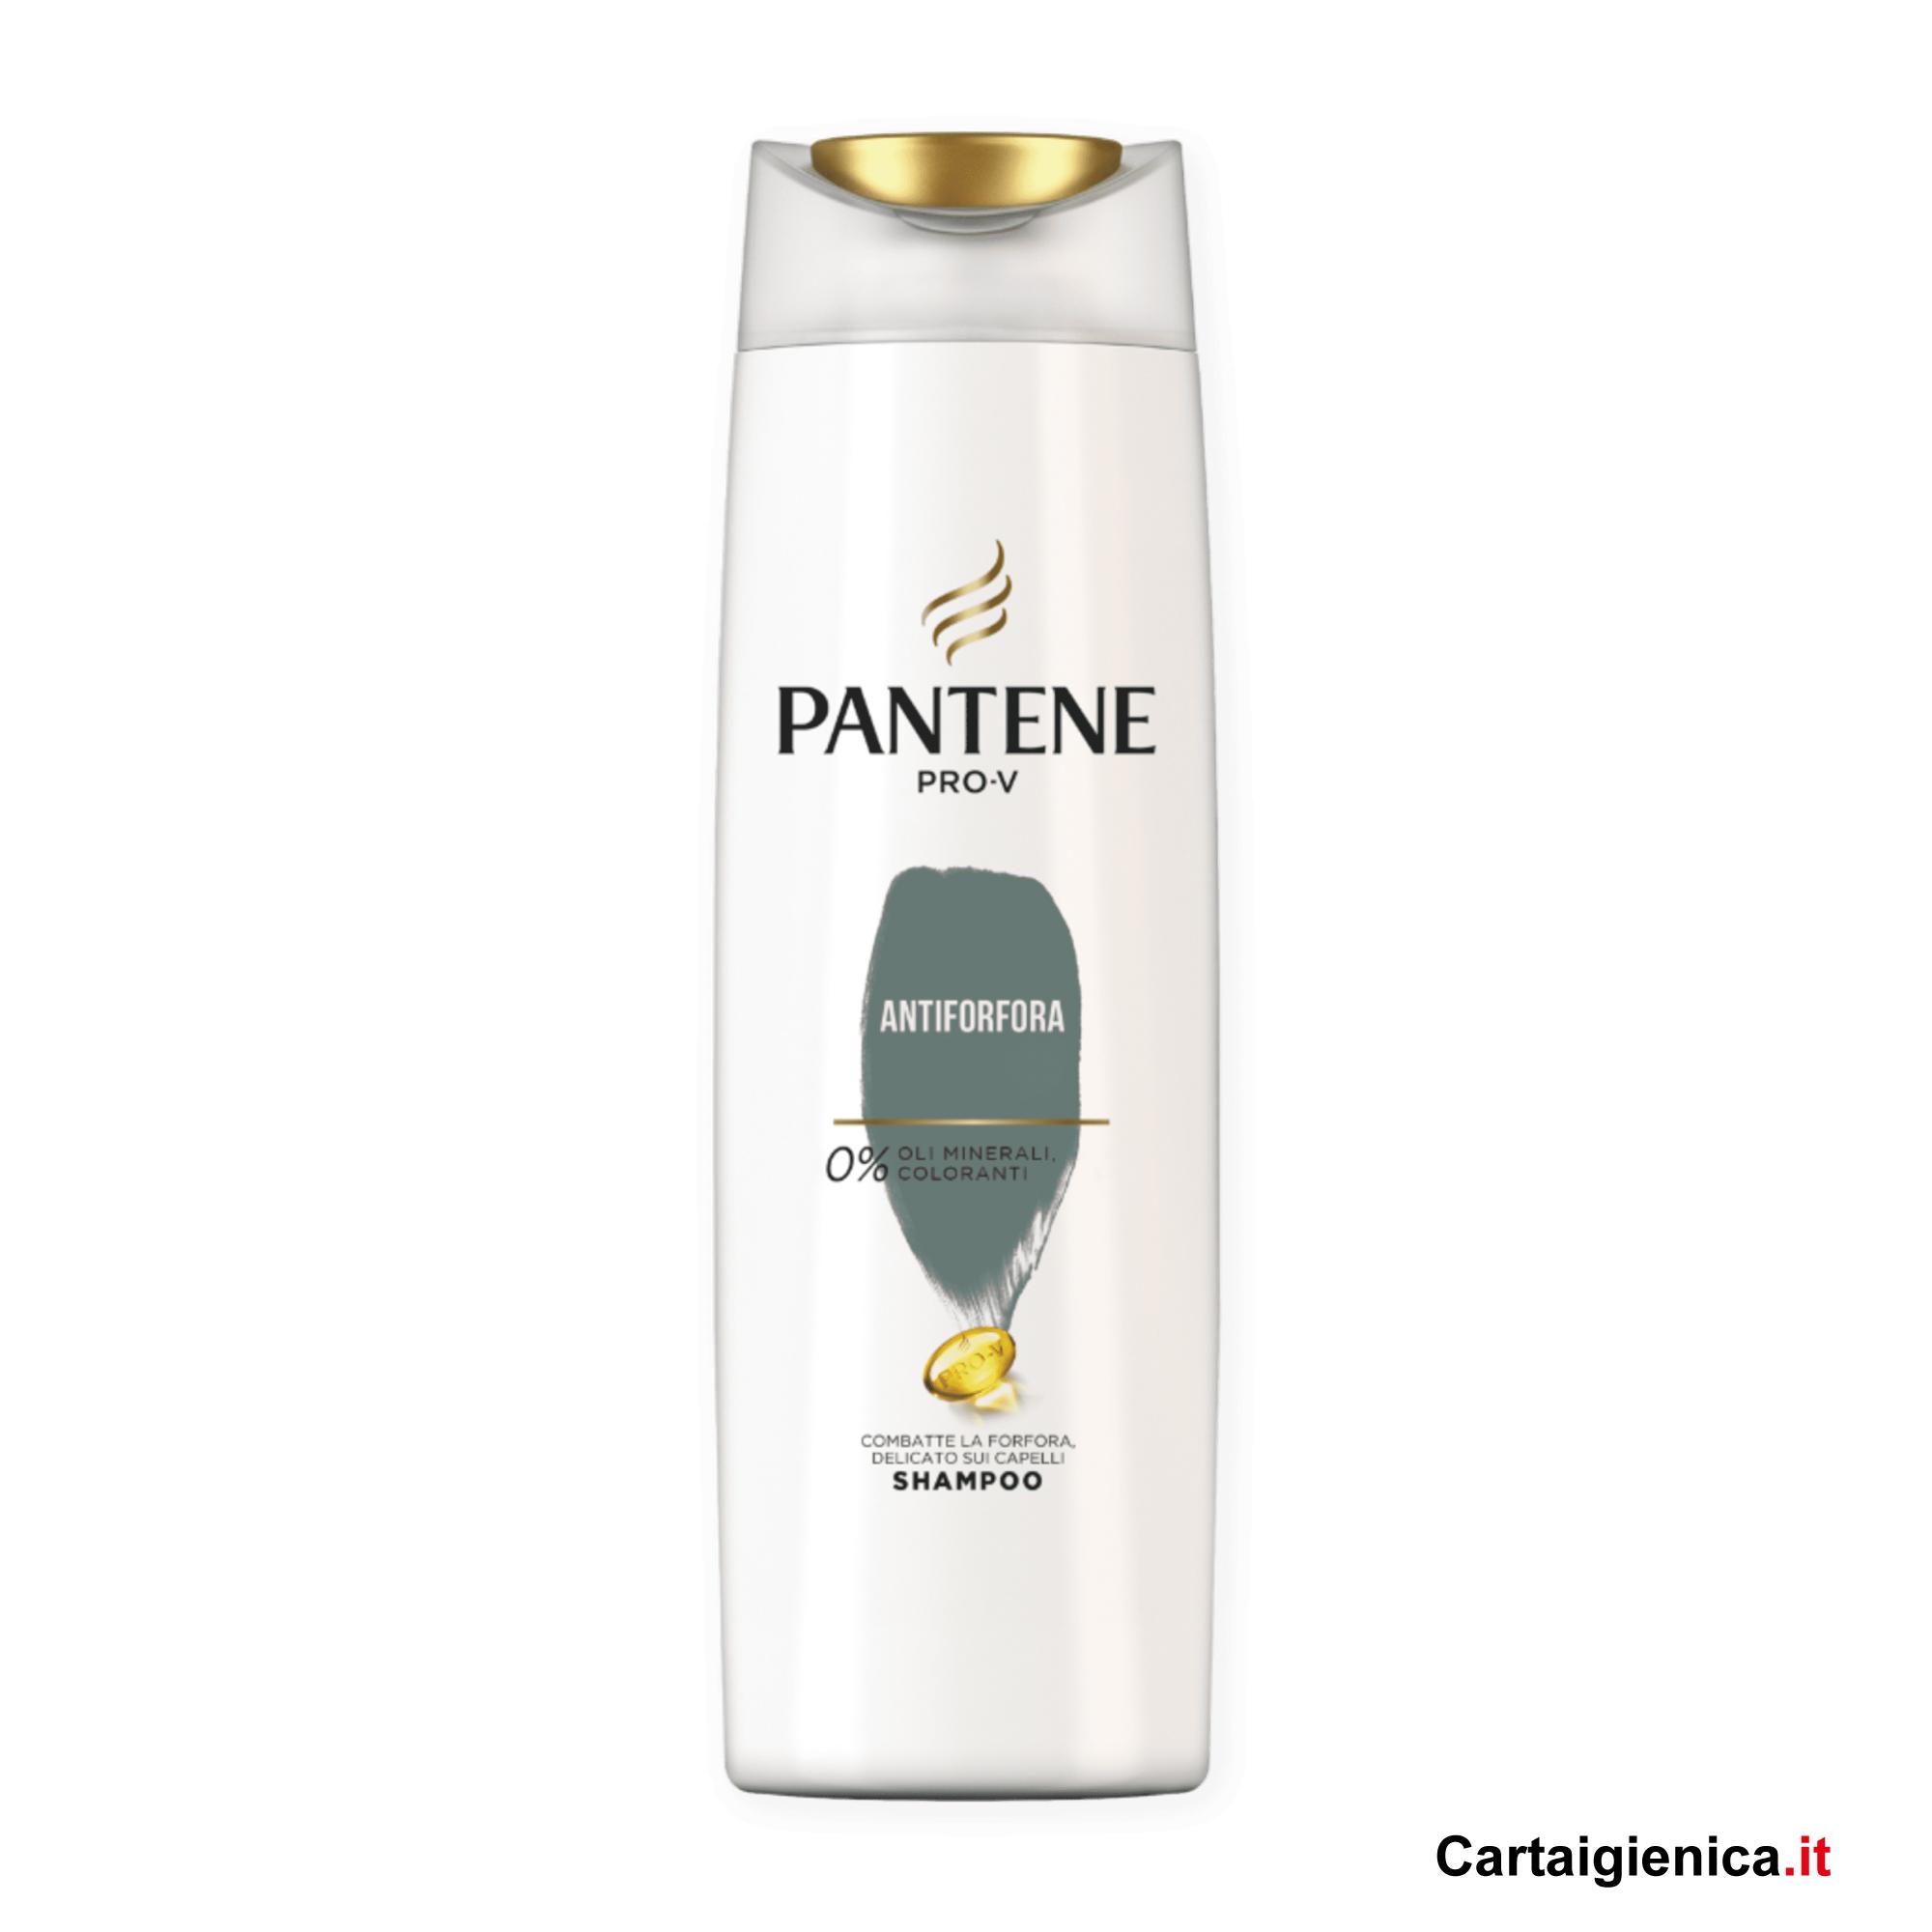 Pantene Shampoo Antiforfora Anticaduta 225 ml